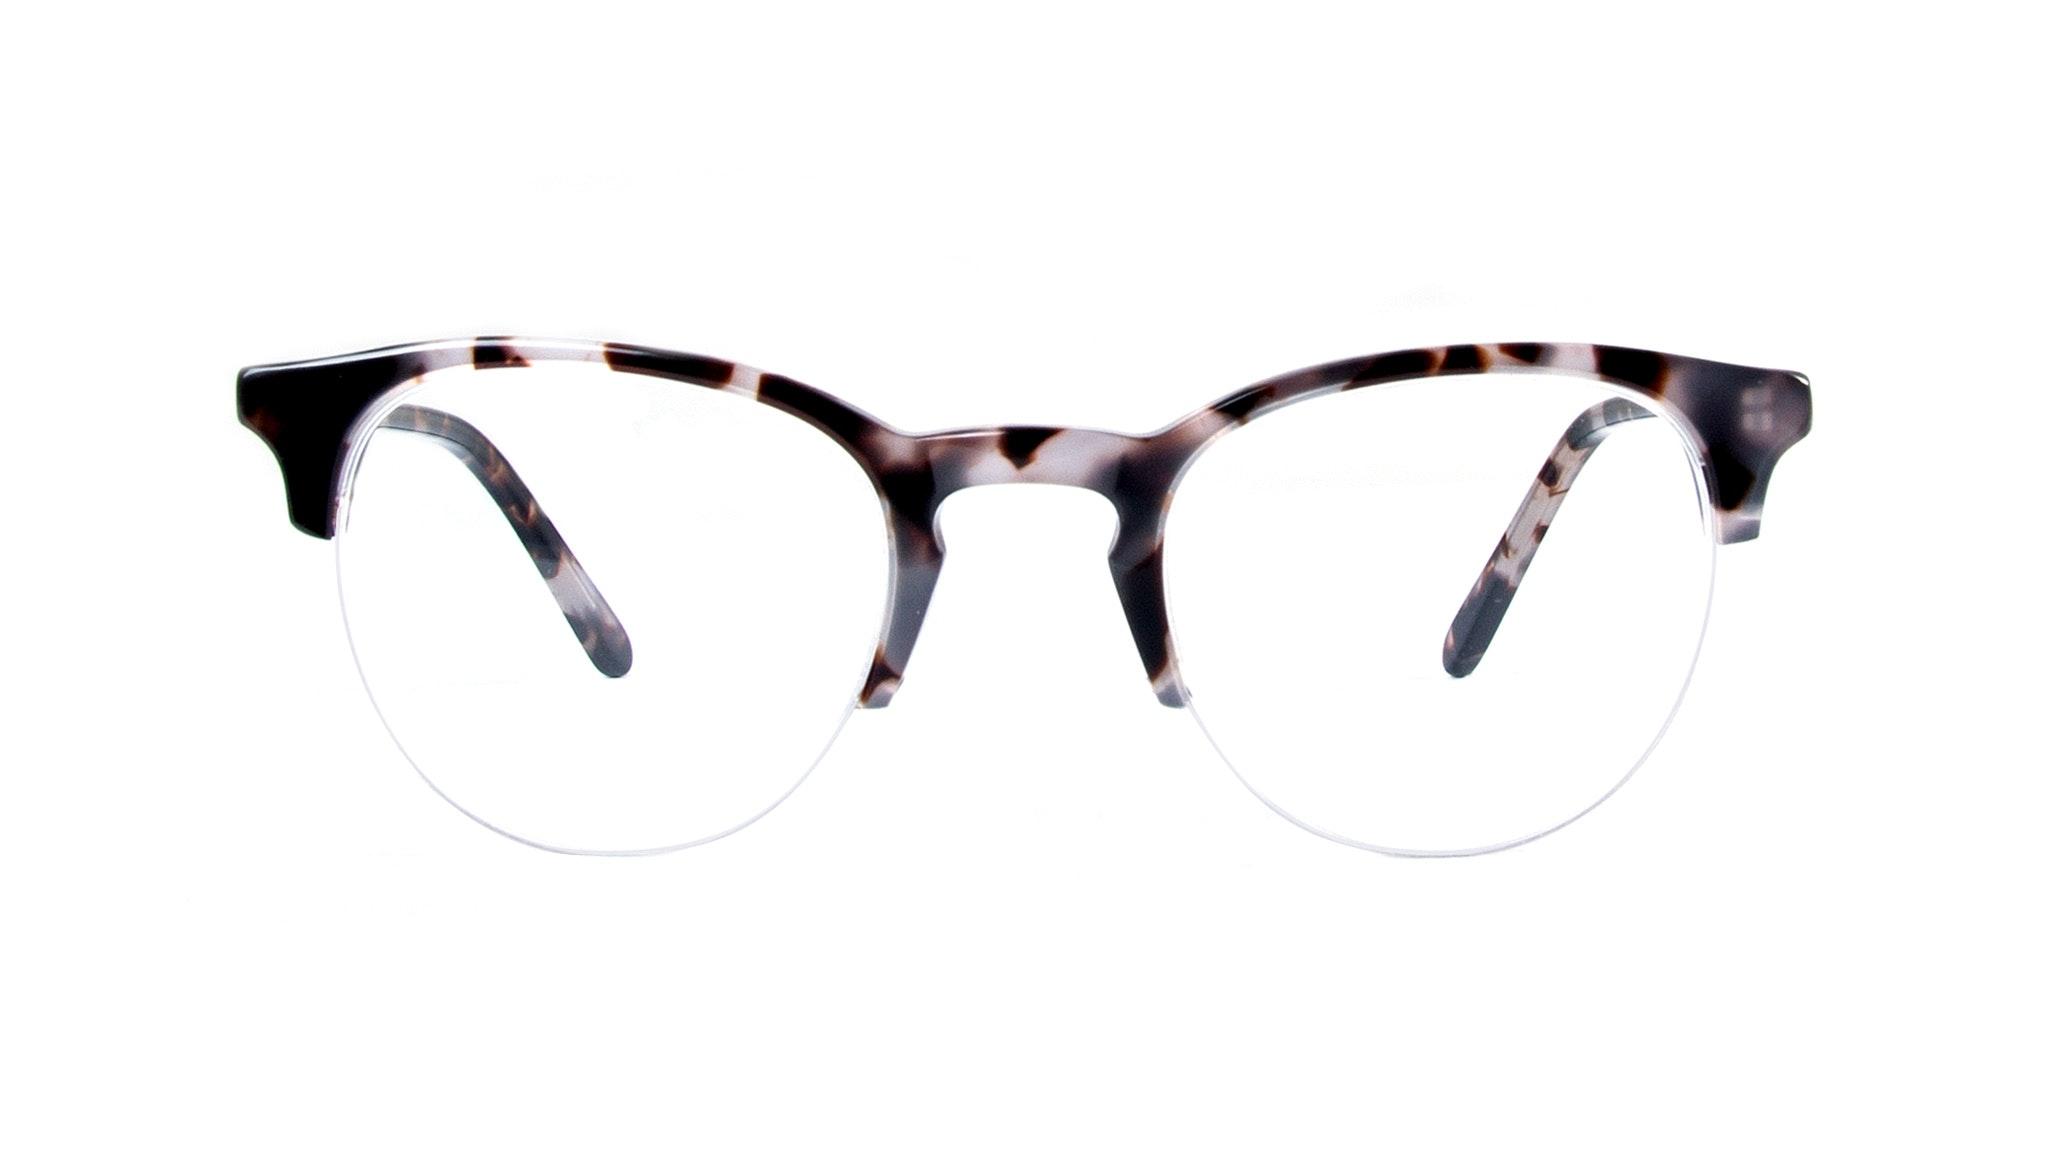 Affordable Fashion Glasses Round Semi-Rimless Eyeglasses Men Women Cult Light Mocha Tortoise Front